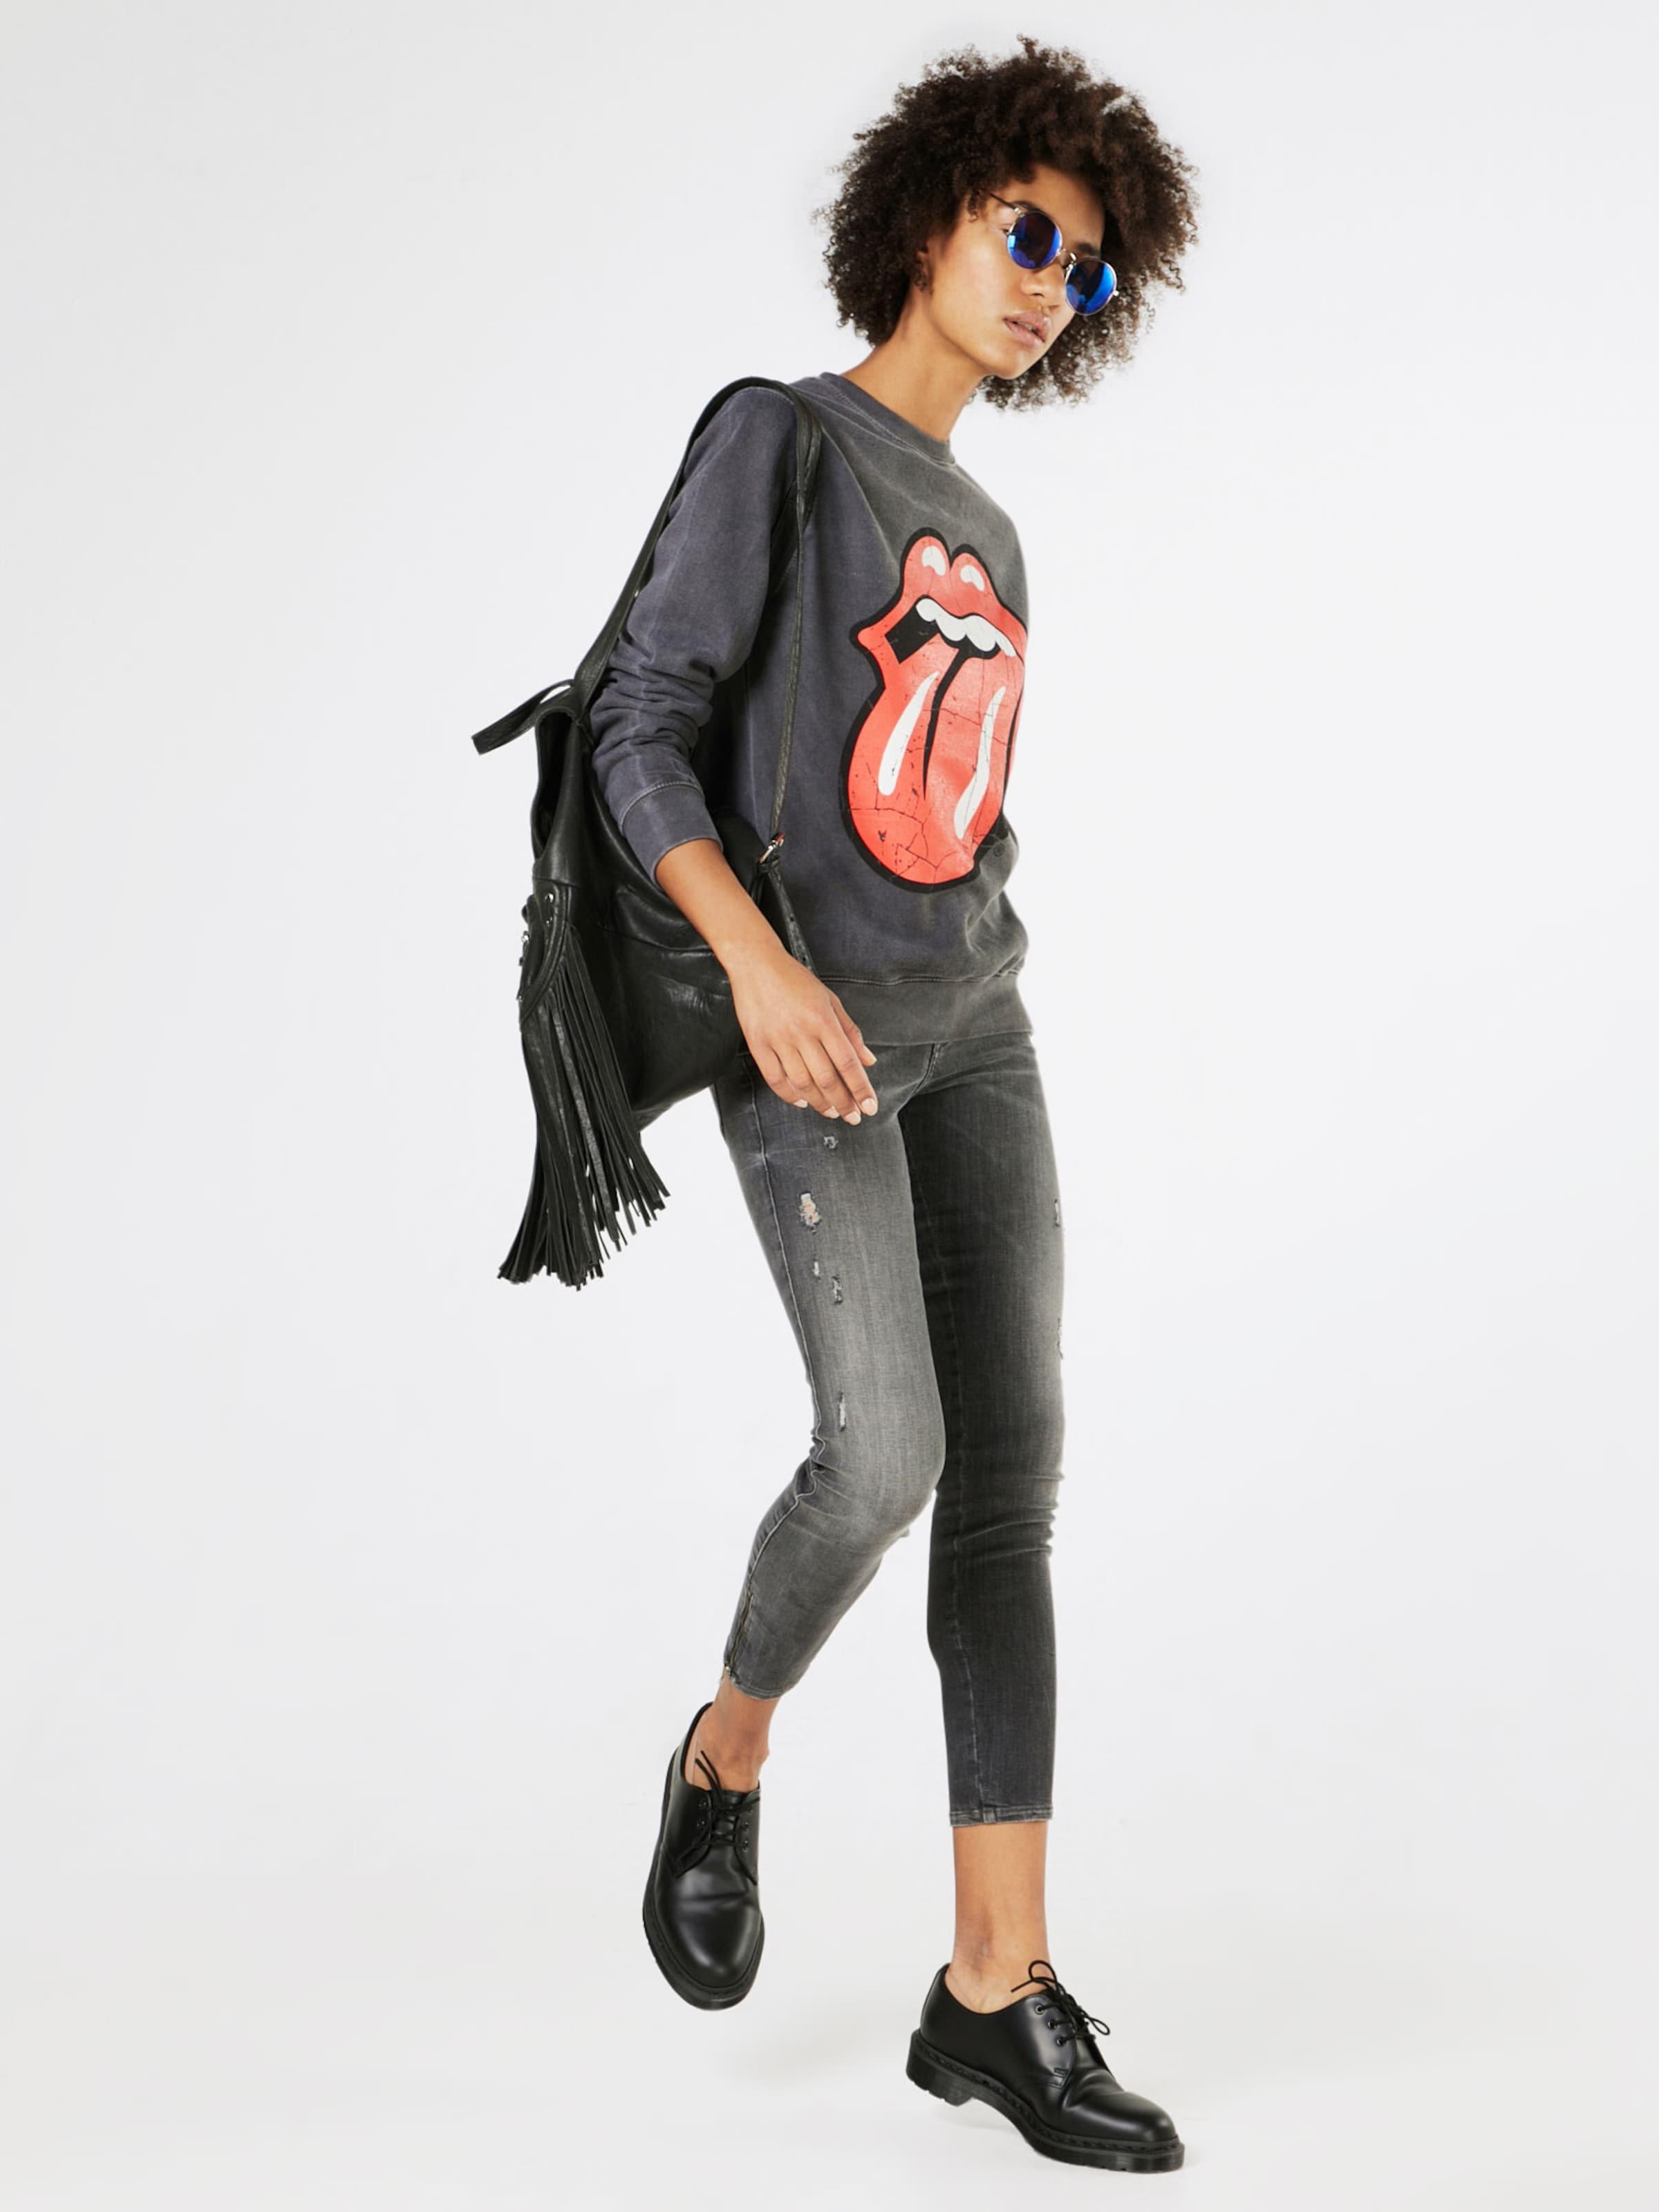 Stones' Boohoo En Gris Sweat shirt 'rolling BasalteRouge Yvyfg6b7